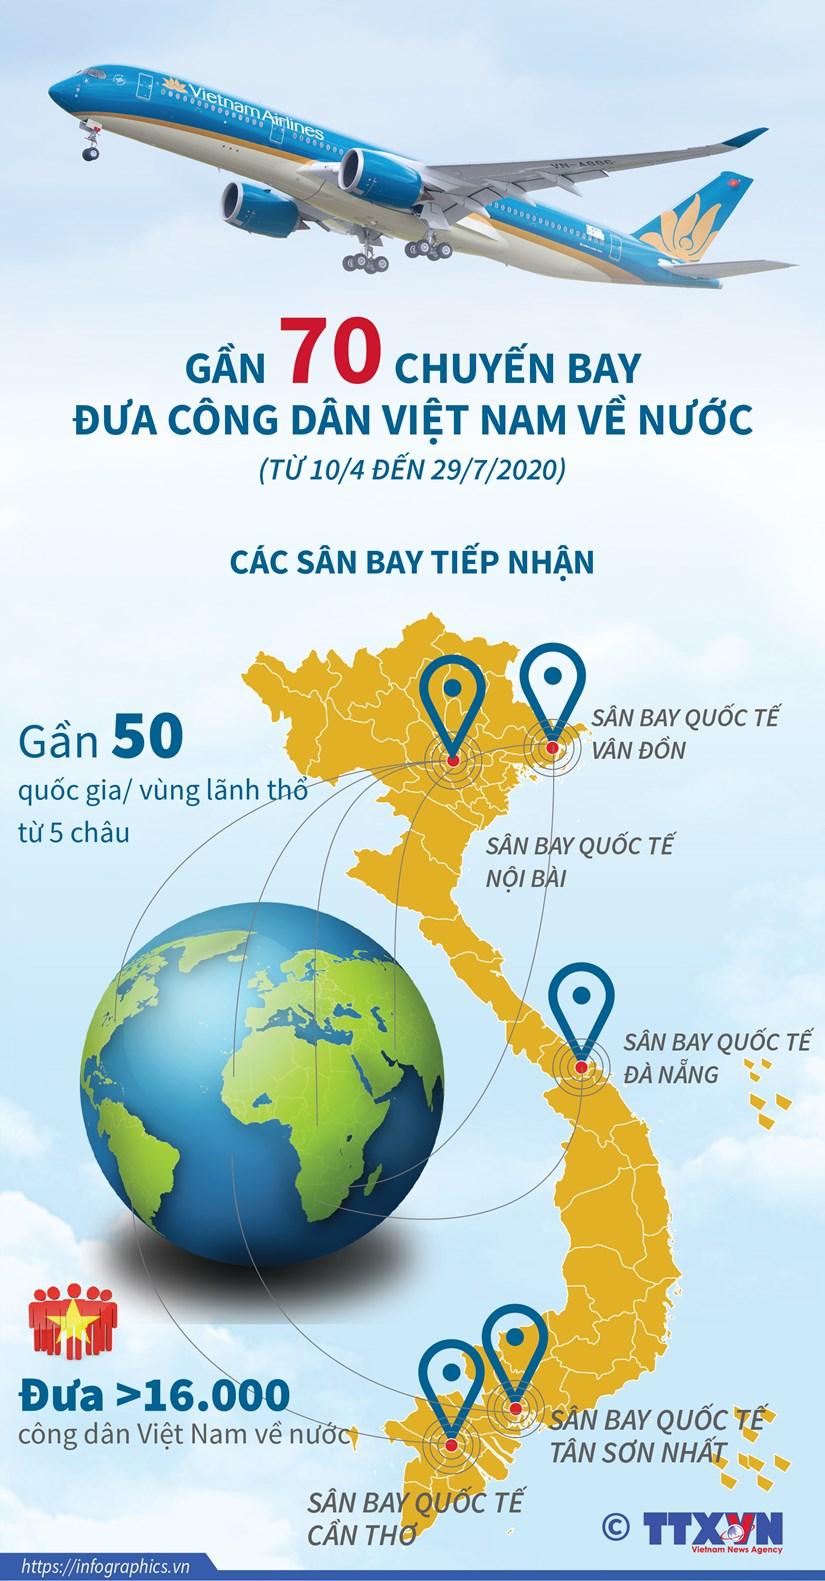 [Infographics] Gan 70 chuyen bay dua cong dan Viet Nam ve nuoc do dich hinh anh 1